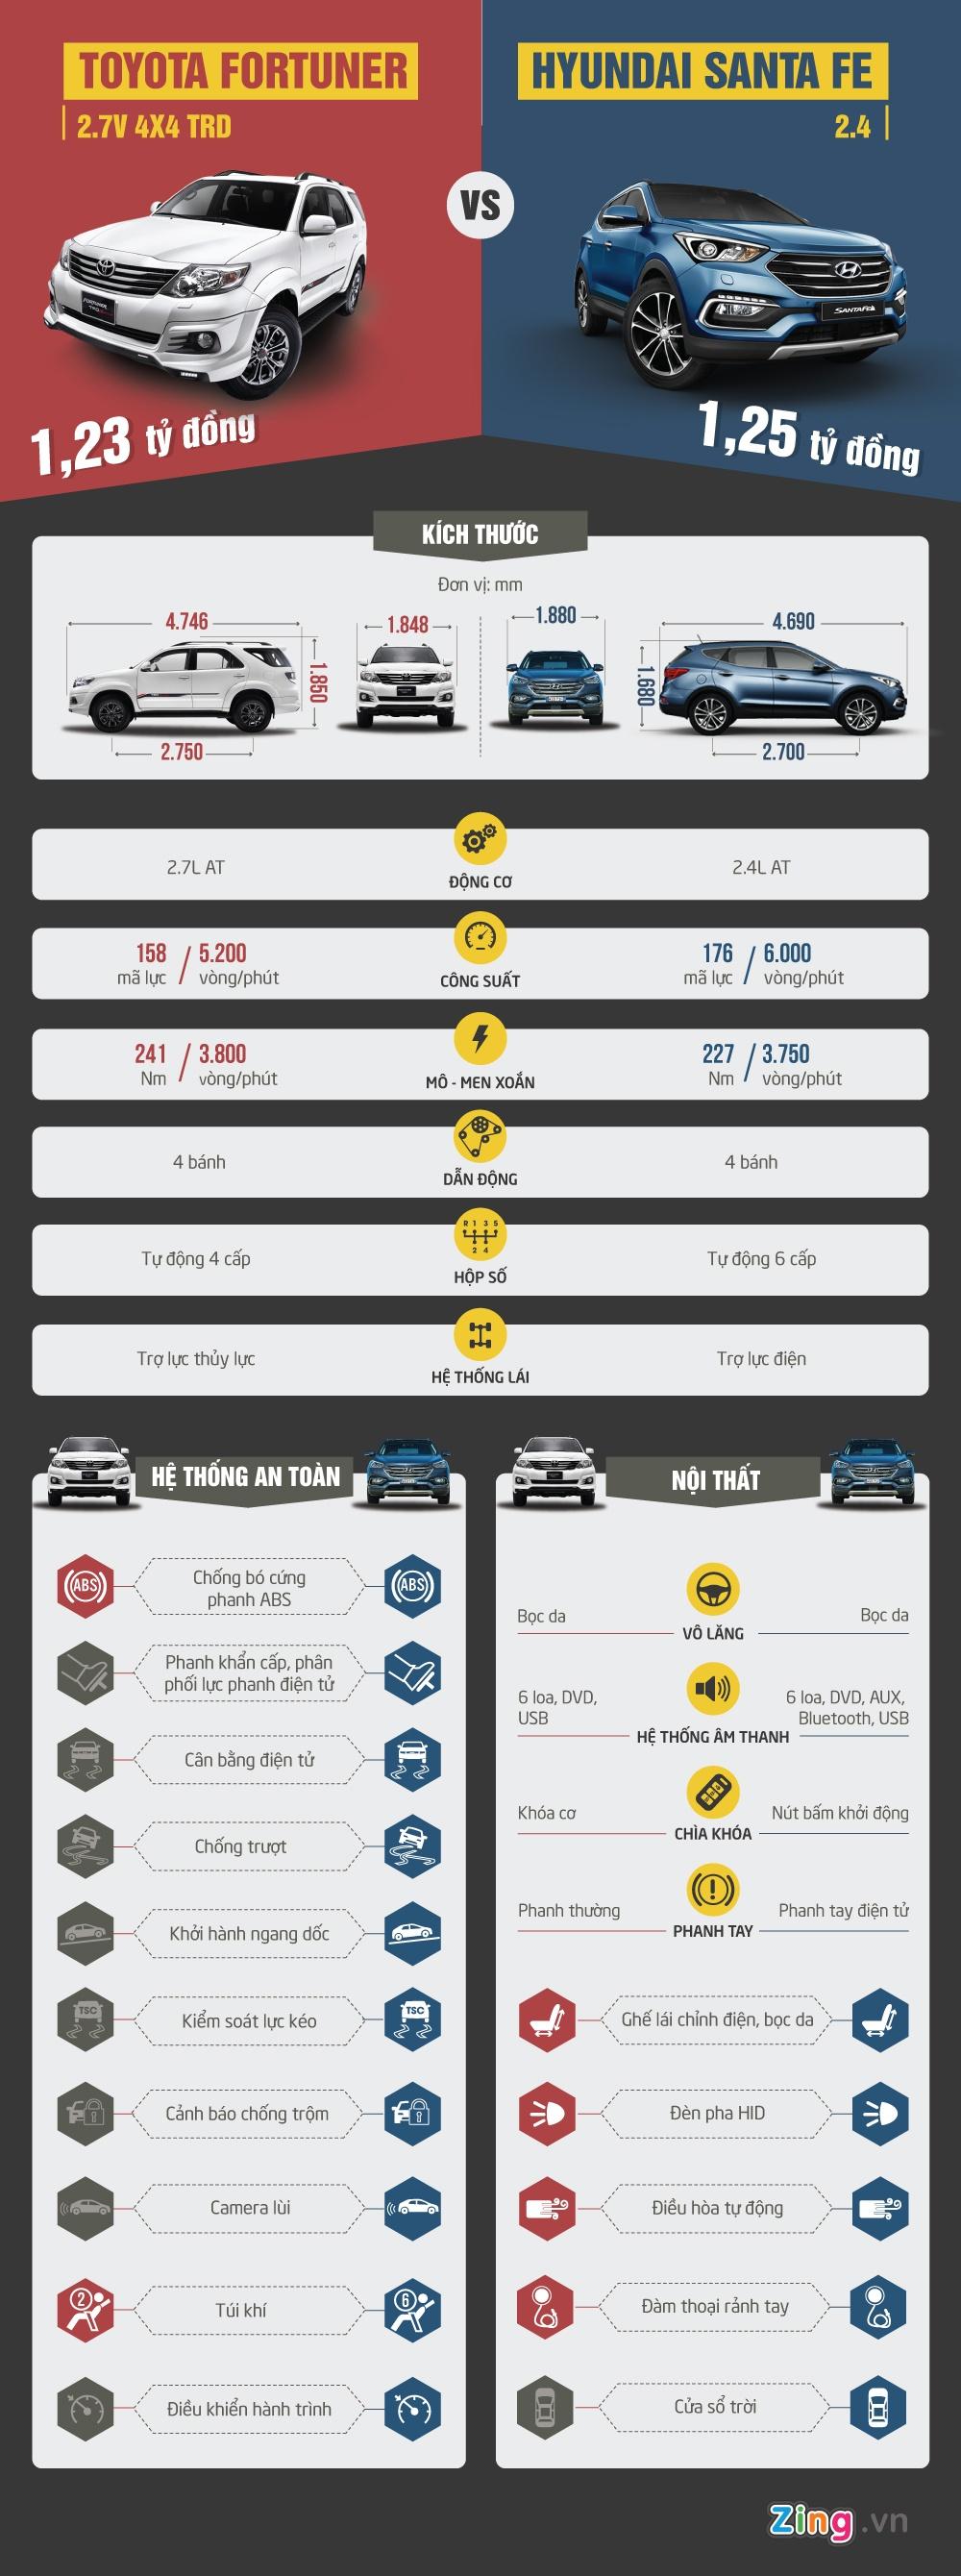 Toyota Fortuner so gang Hyundai Santa Fe o Viet Nam hinh anh 1